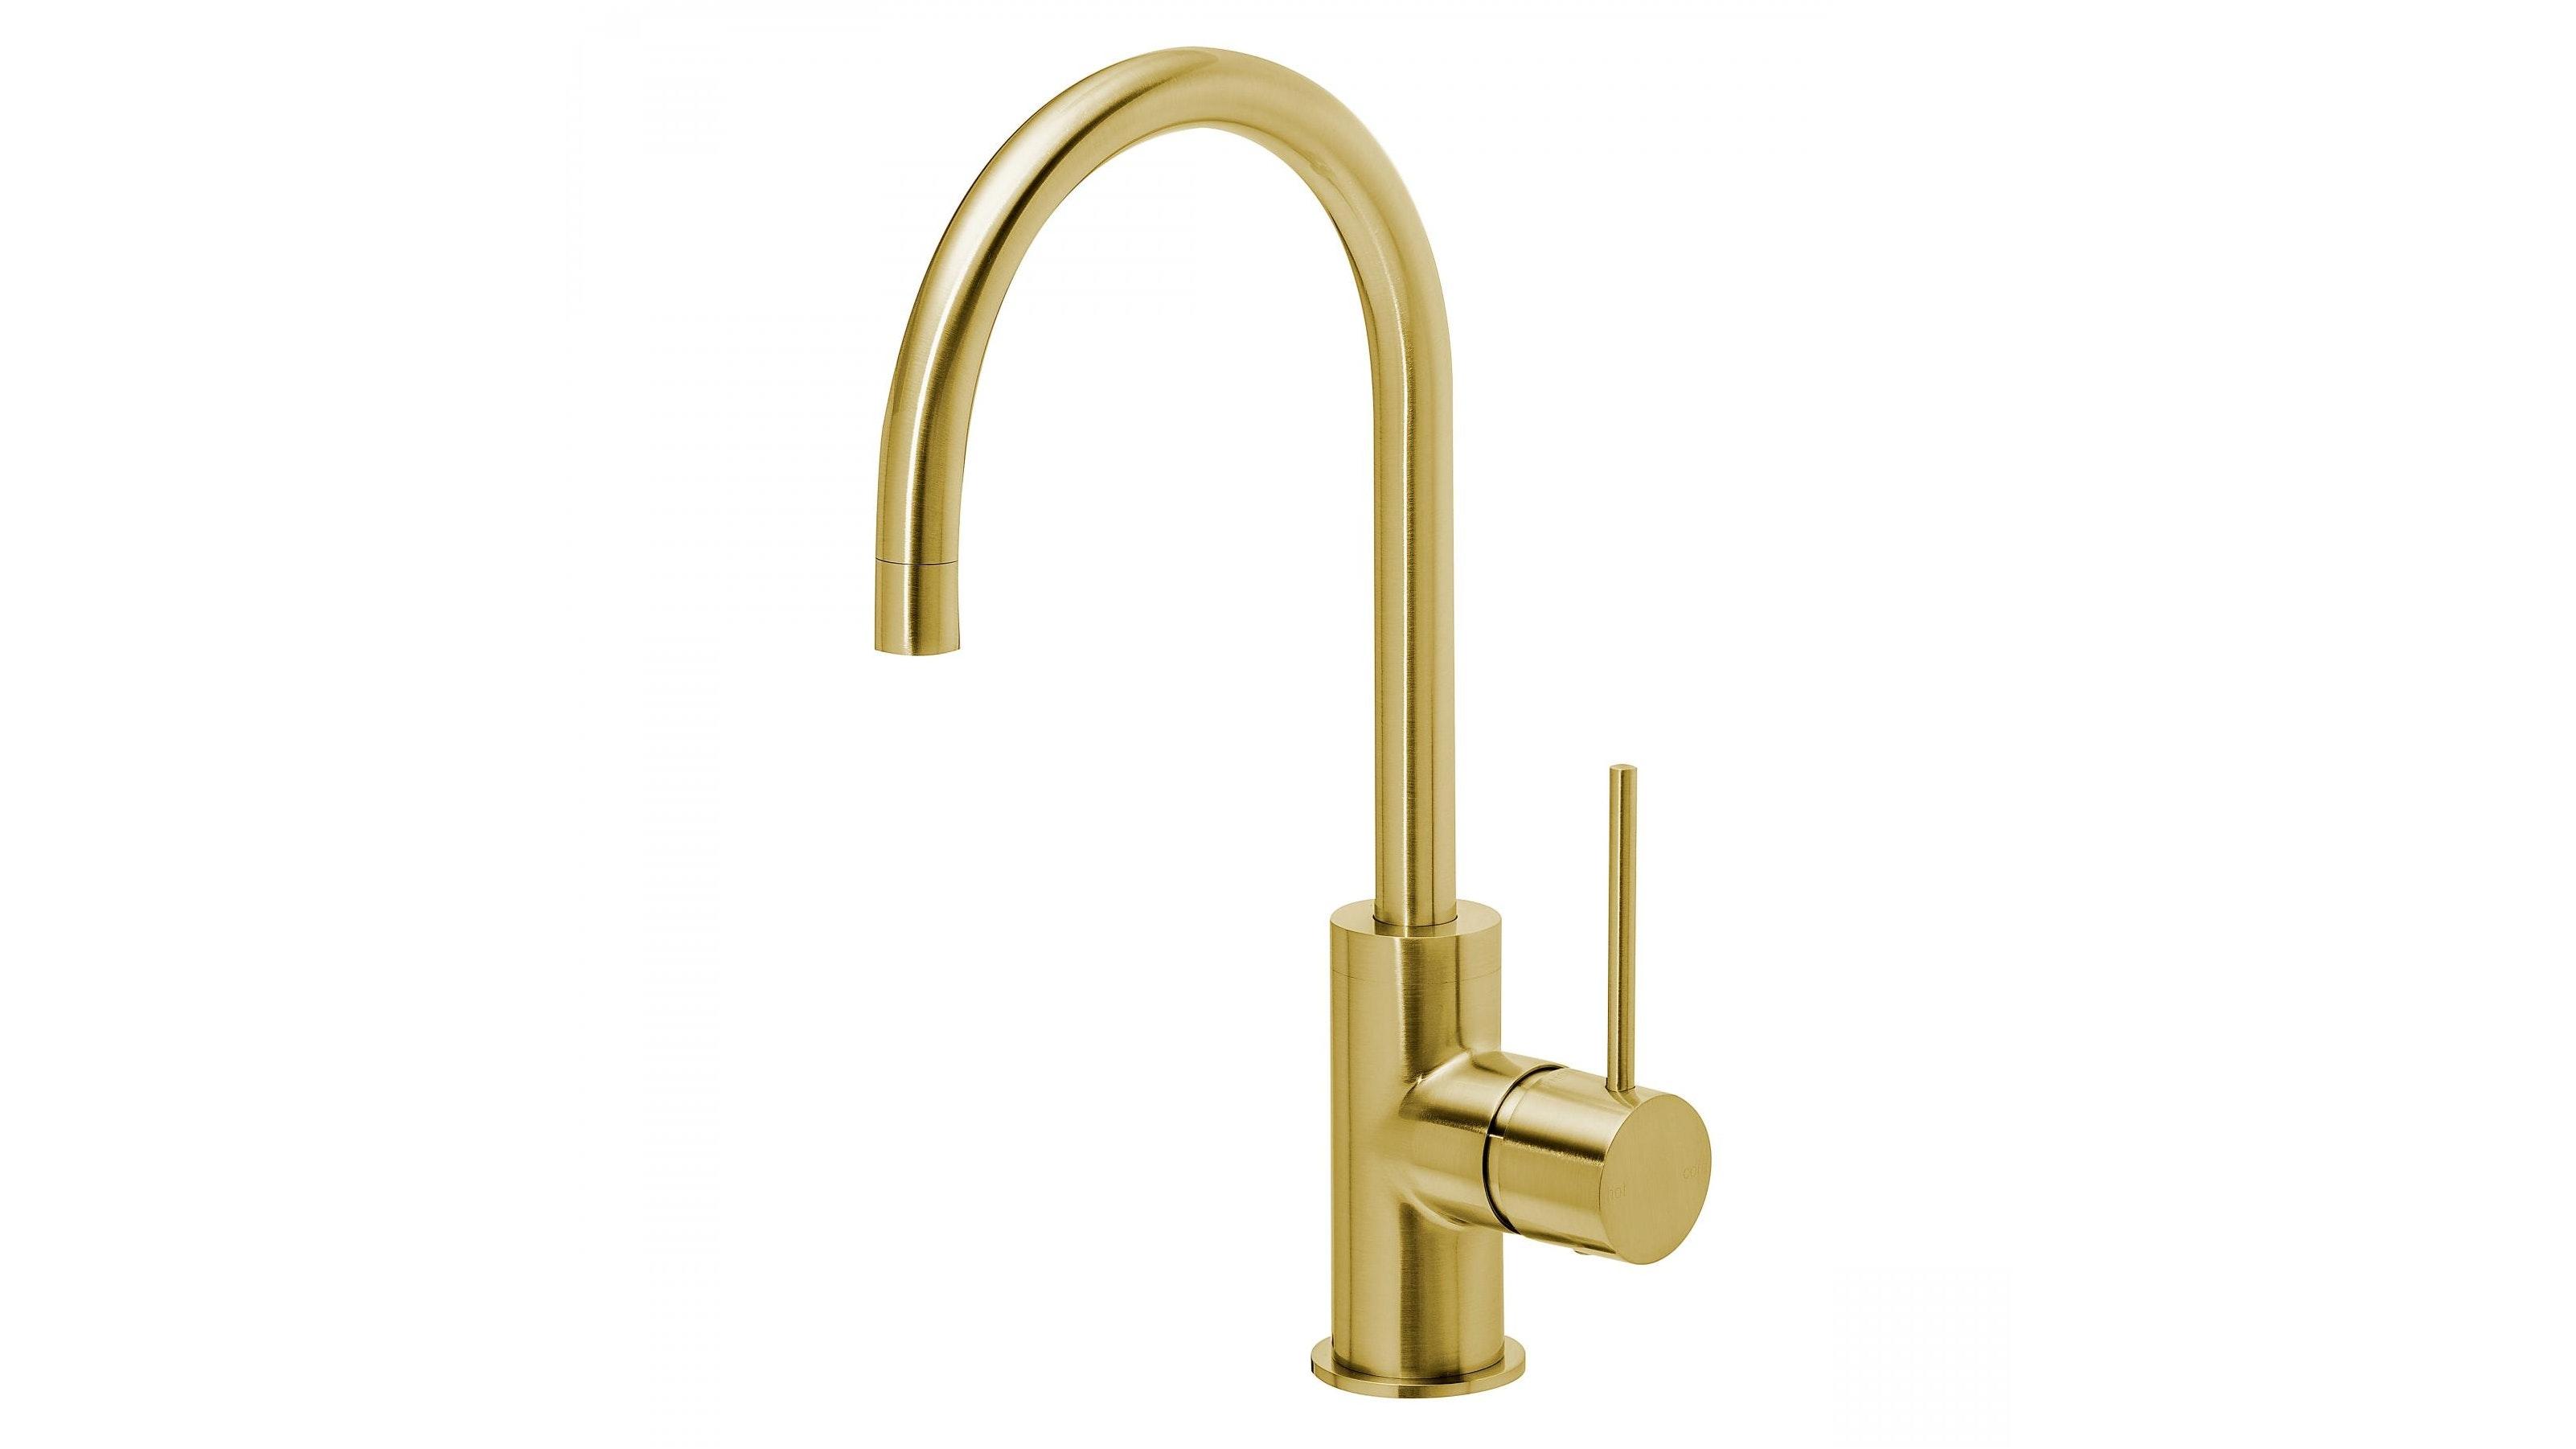 Phoenix Vivid Slimline 160 Gooseneck Sink Mixer - Brushed Gold